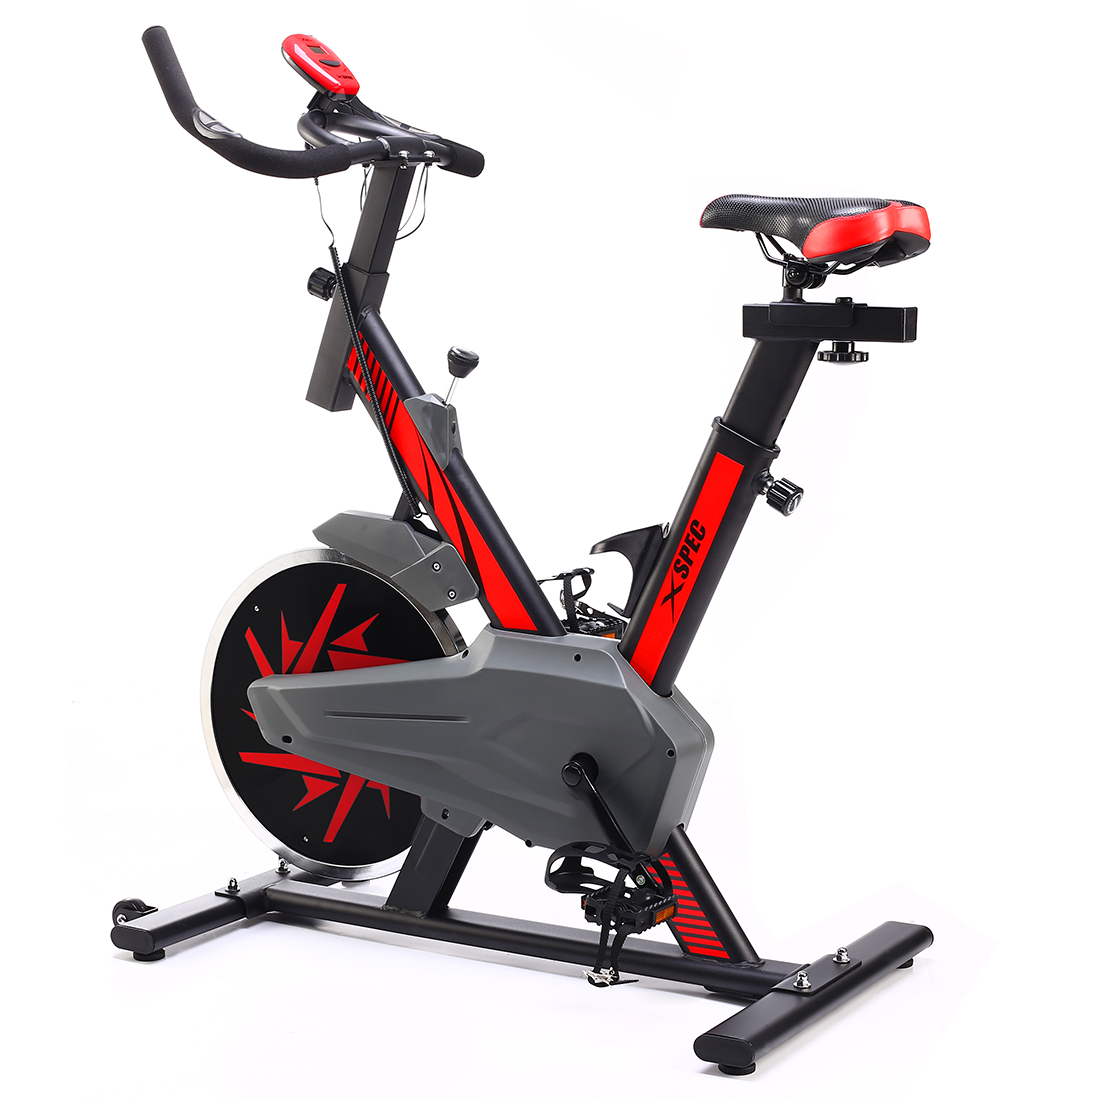 Xspec Pro Stationary Upright Red Exercise Cycling Bike w/ 25 LB Flywheel, Heart Pulse Sensors